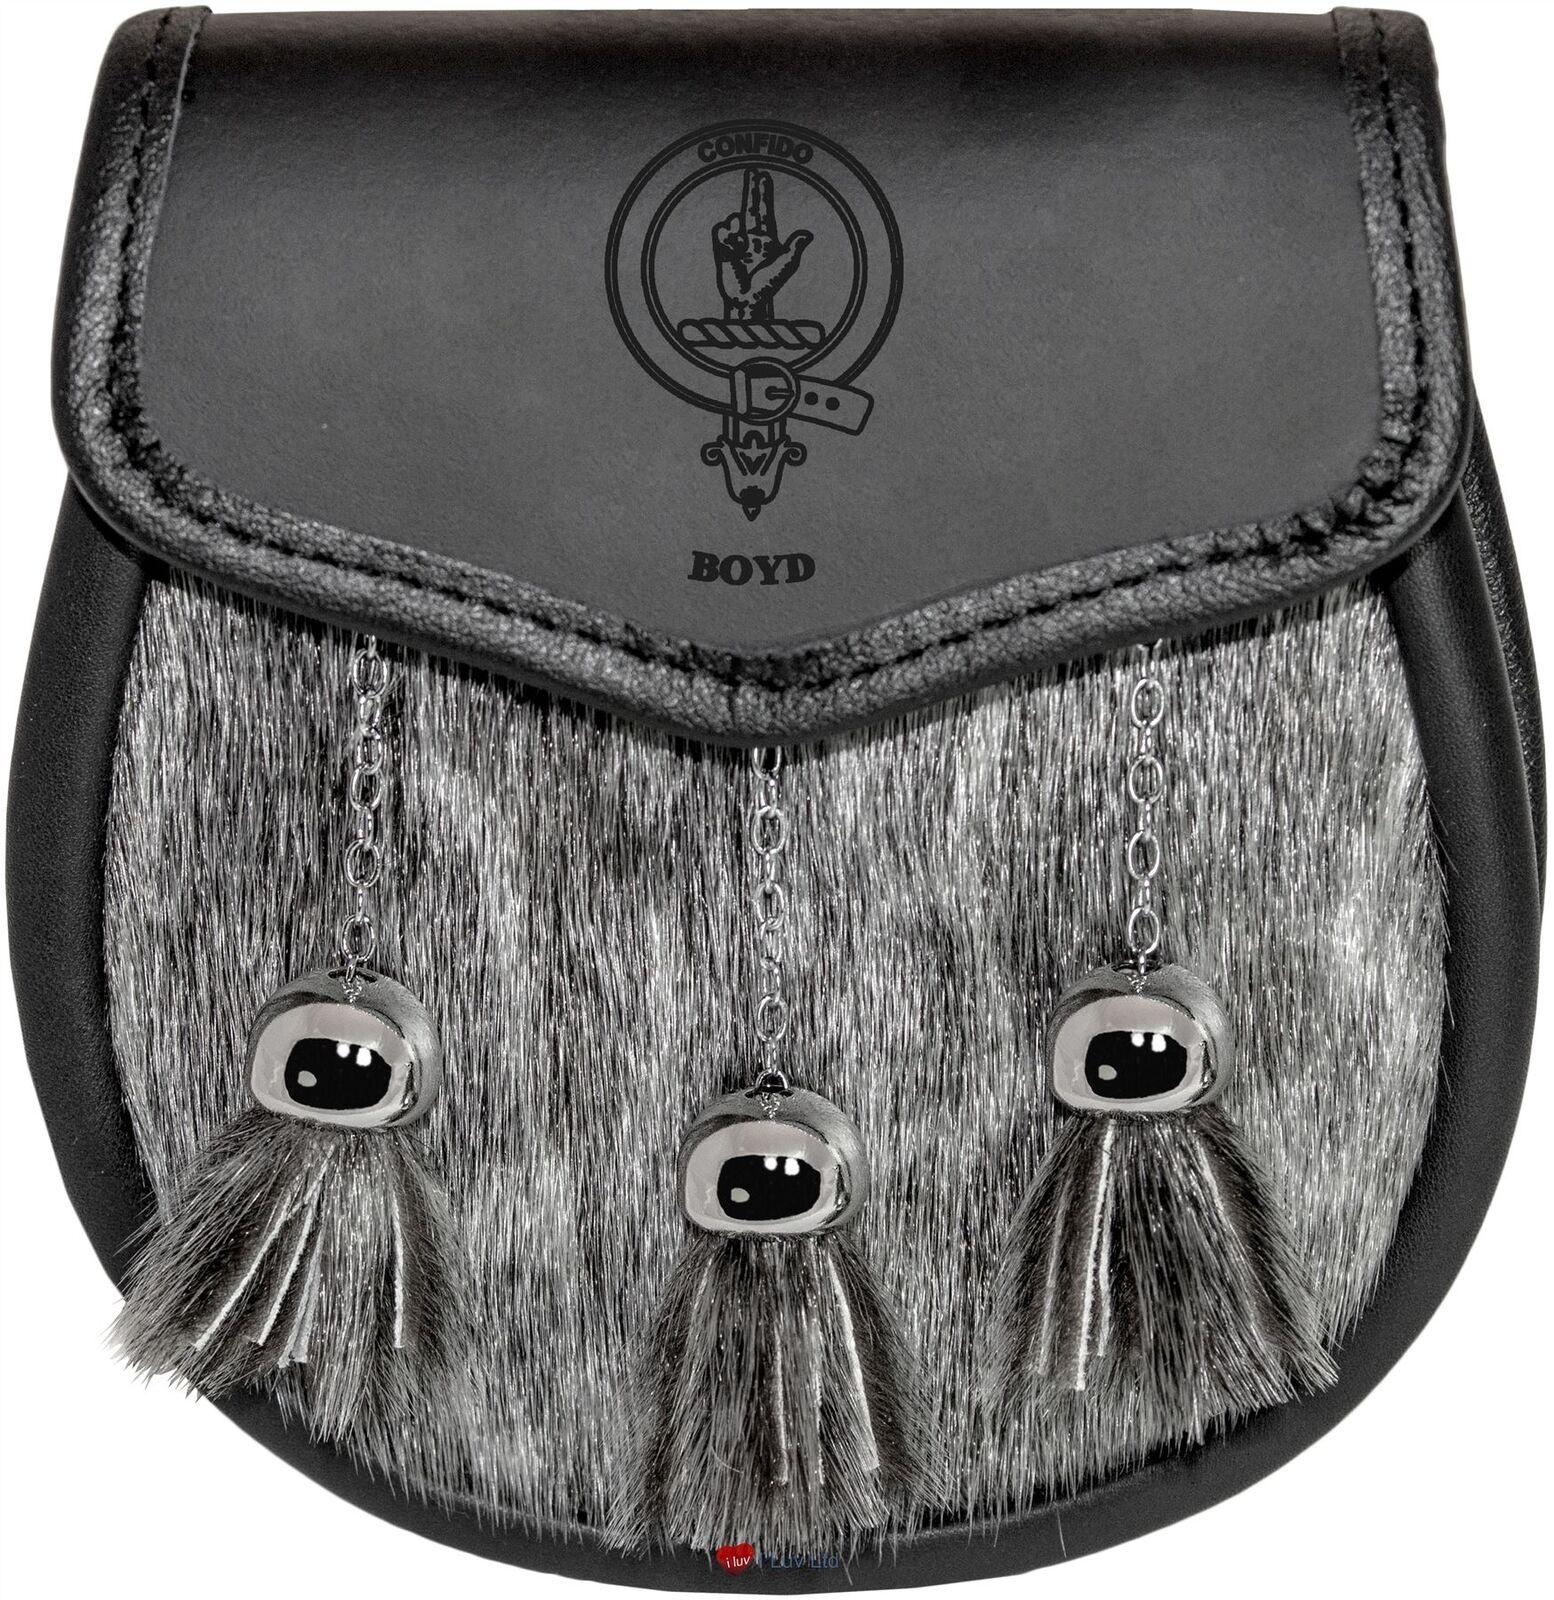 Boyd Semi Dress Sporran Fur Plain Leather Flap Scottish Clan Crest